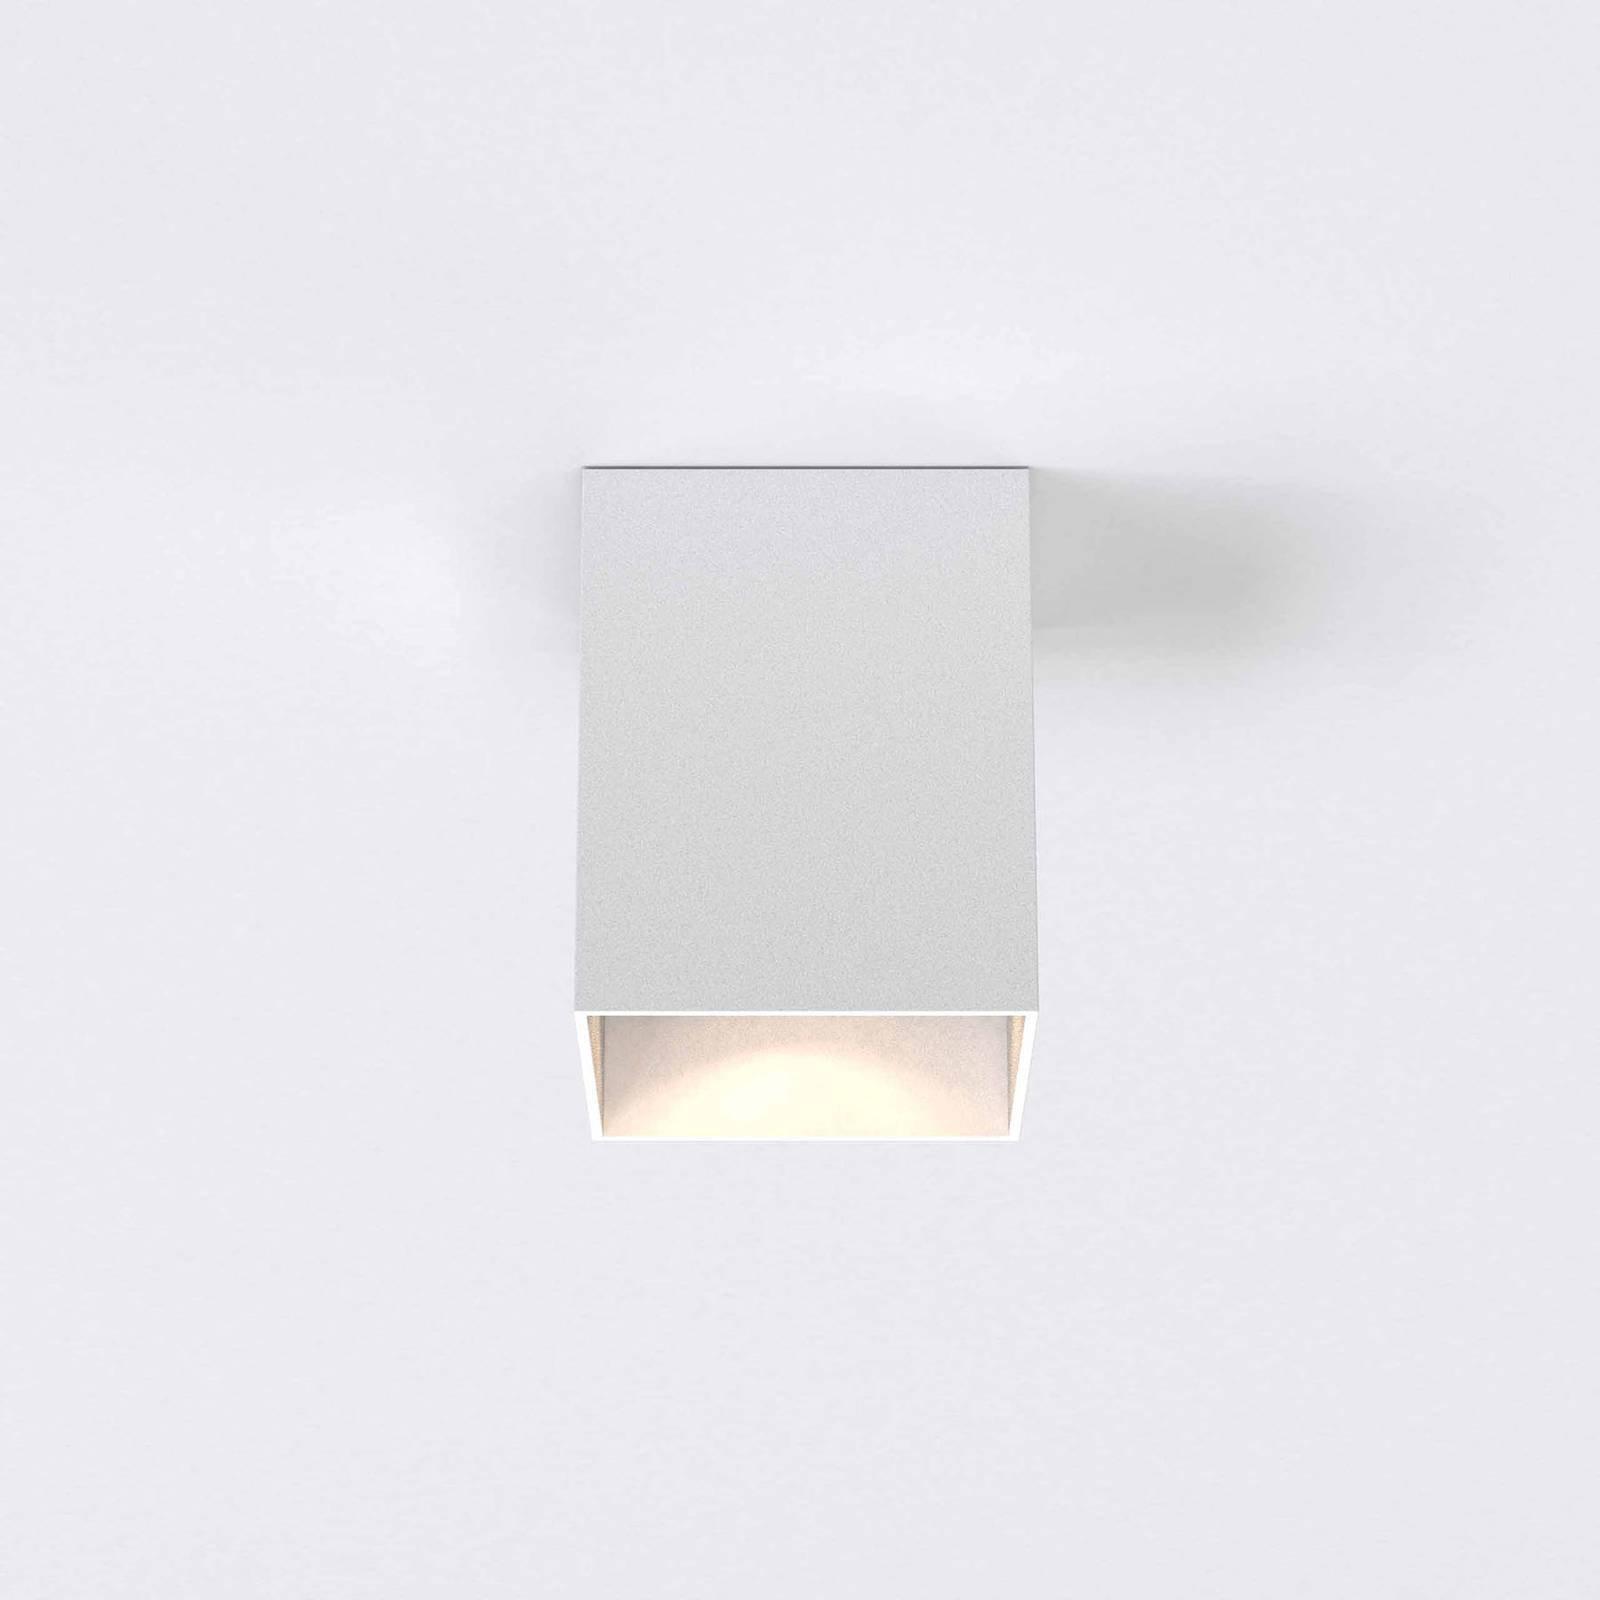 Astro Kinzo 140 LED-taklampe, hvit